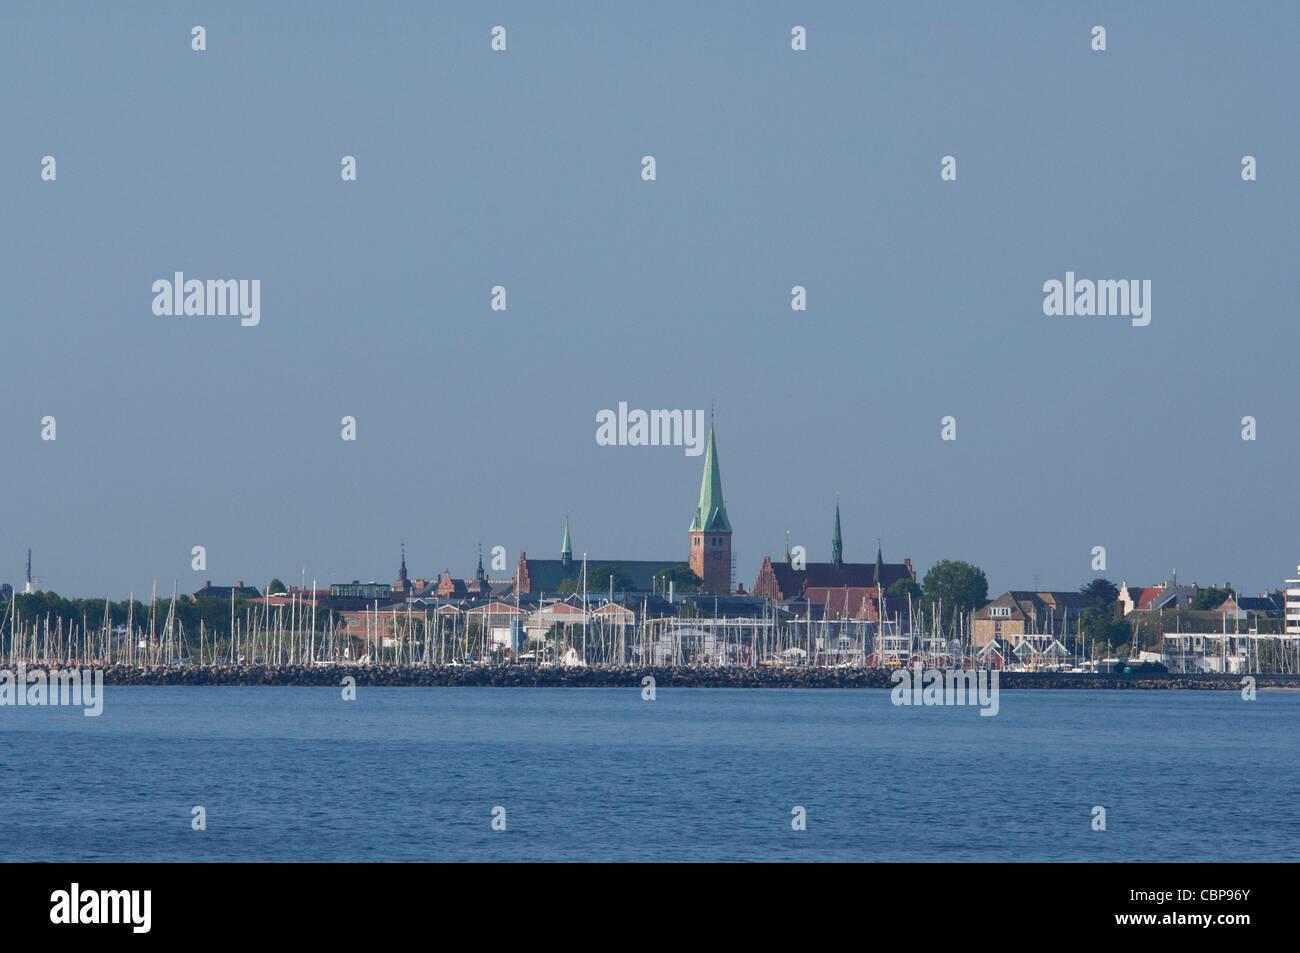 Denmark, Helsingoer. North Sea view of the port area of Helsingoer and historic city skyline. - Stock Image